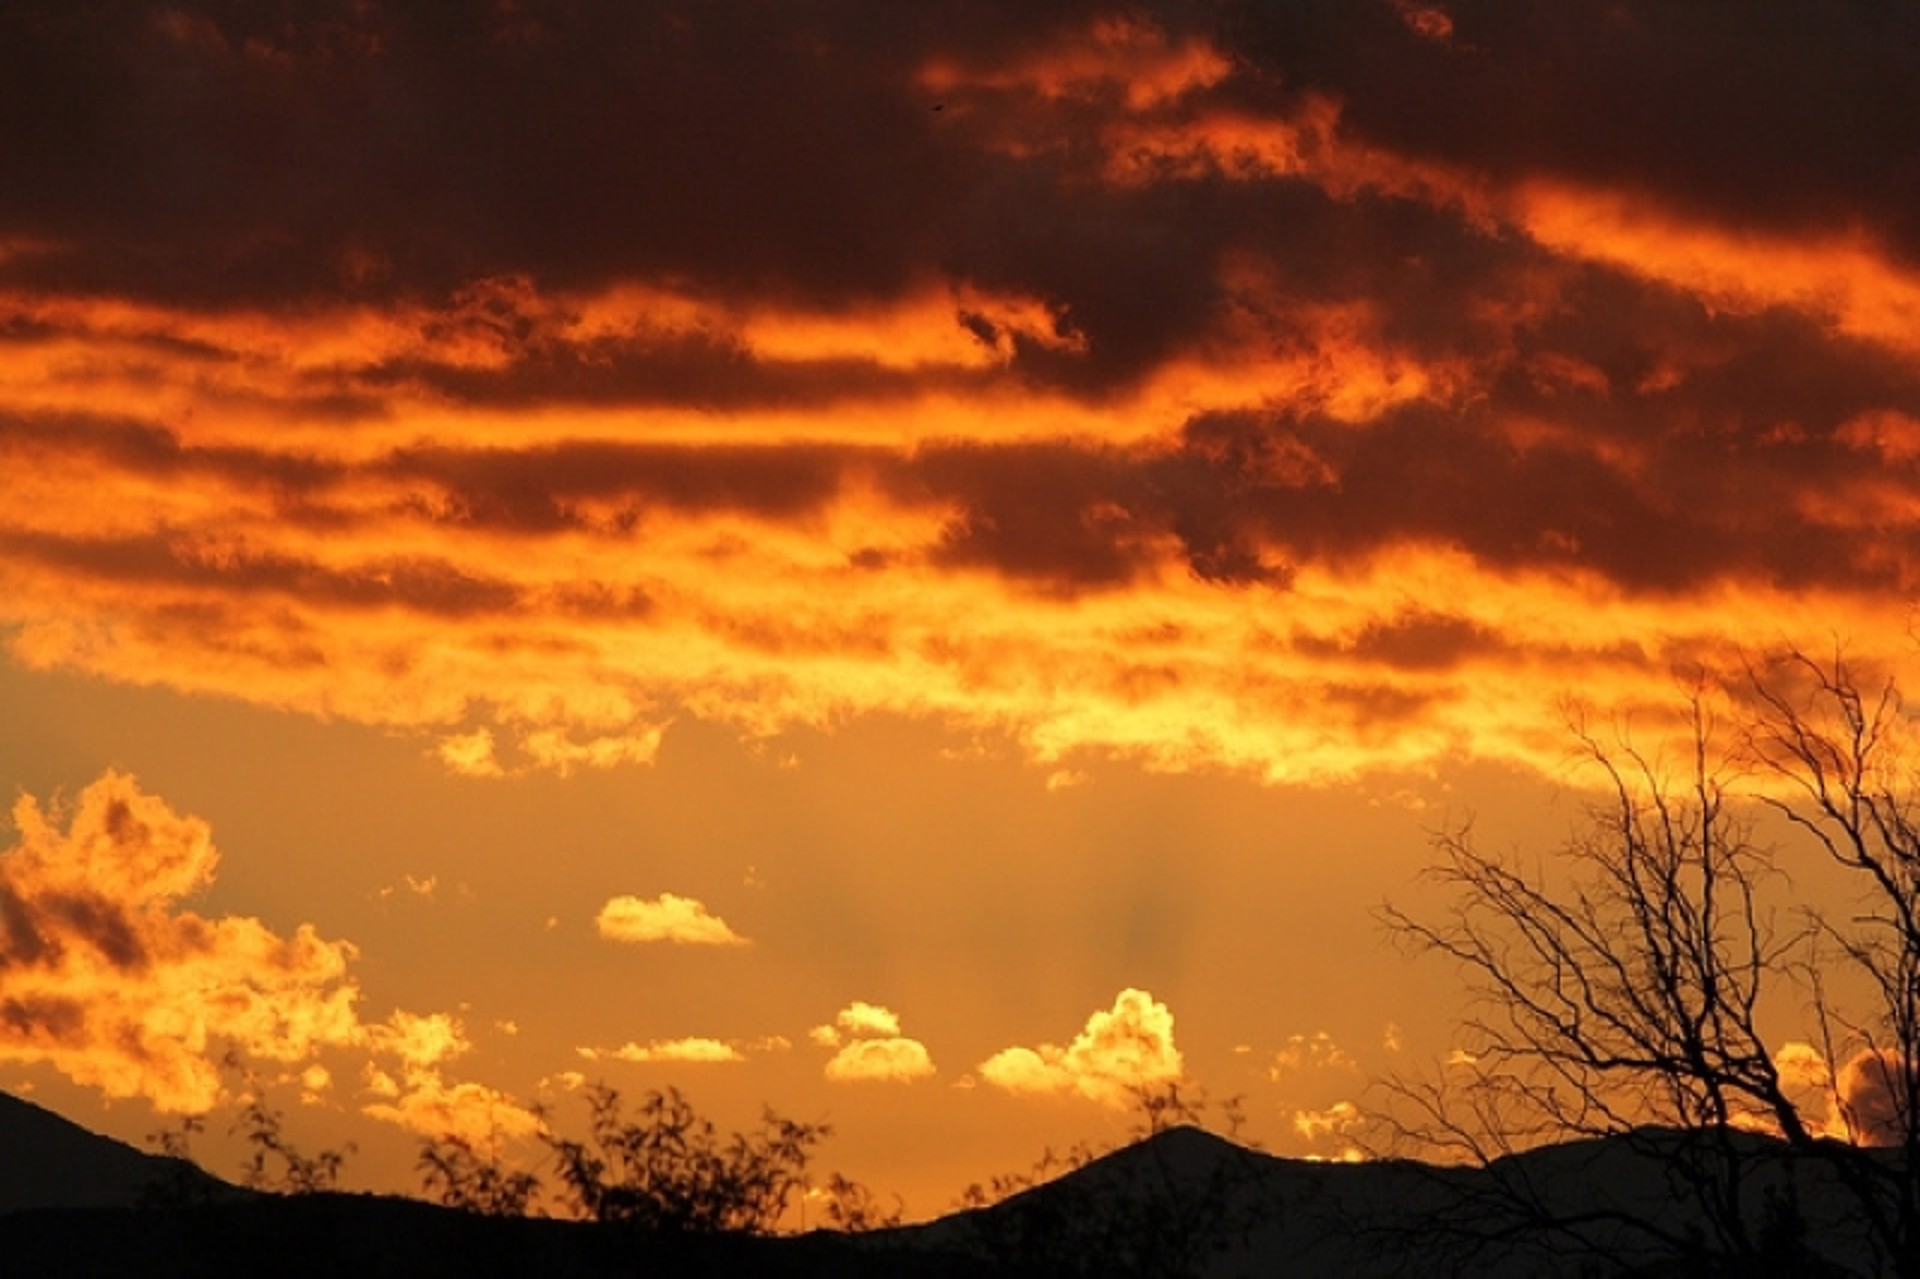 Golden Sunrise by John Hays